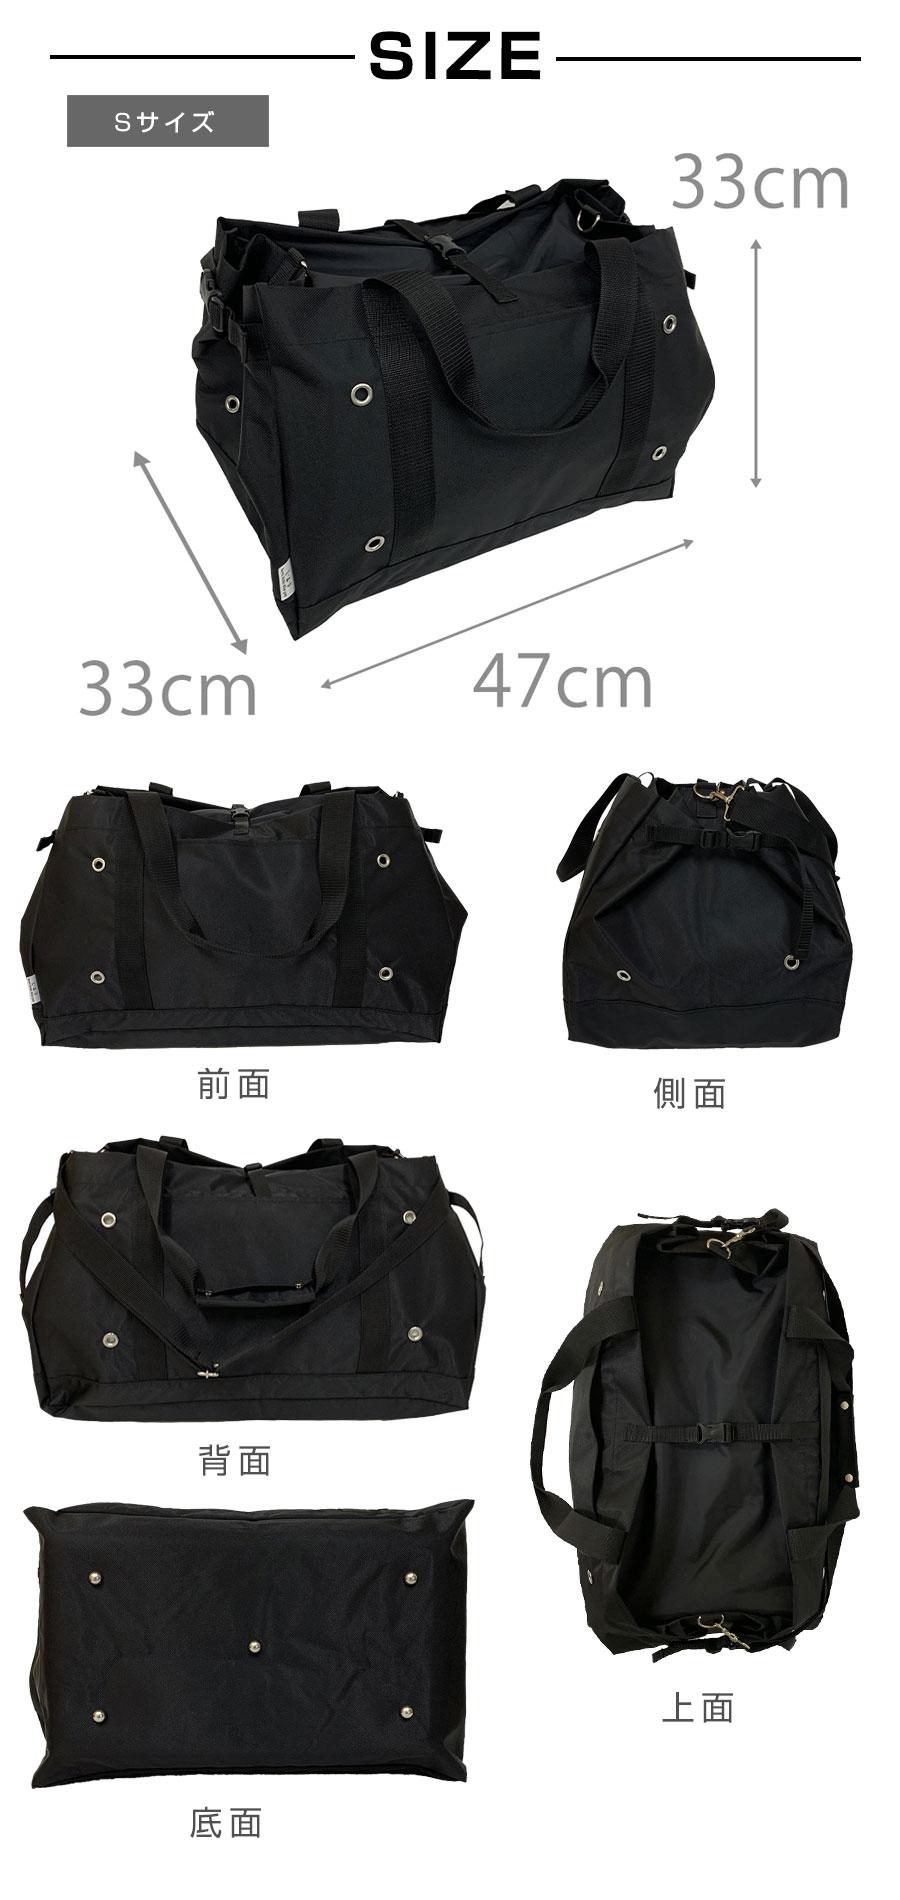 LIP1003 移動用キャリーがすっぽり収まる便利なバッグSサイズ